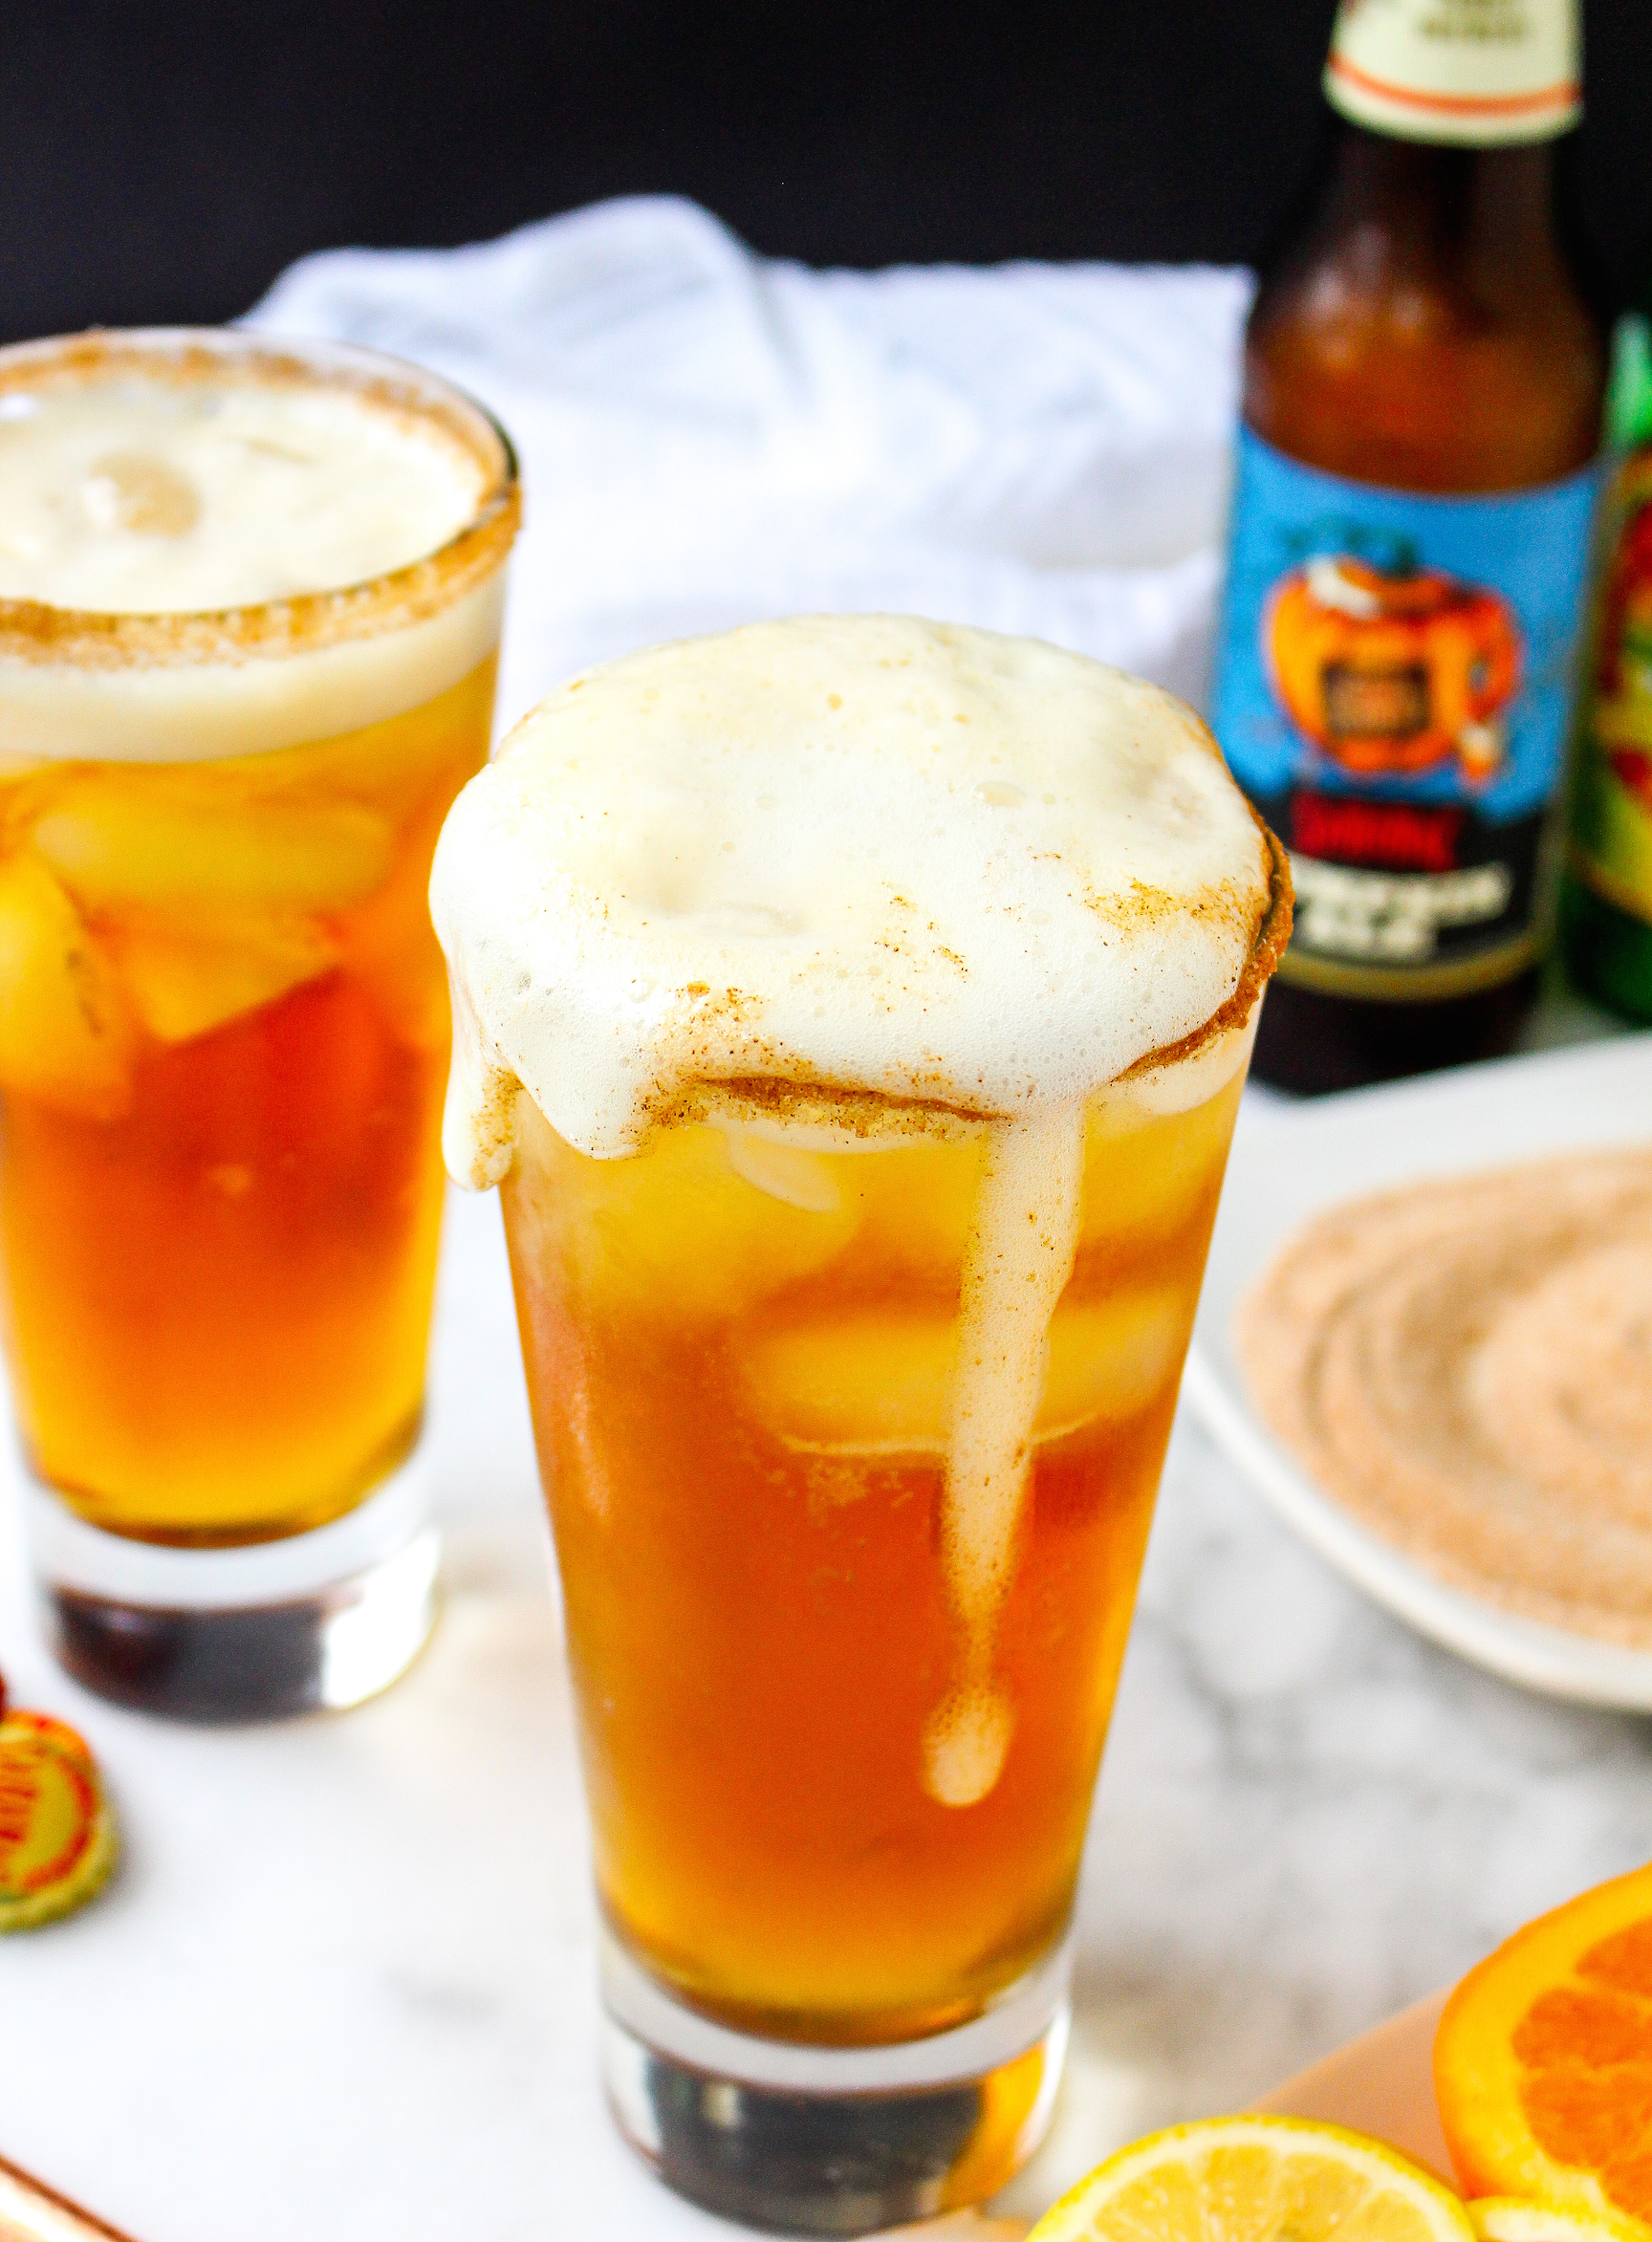 Gingered Pumpkin Beer Shandy